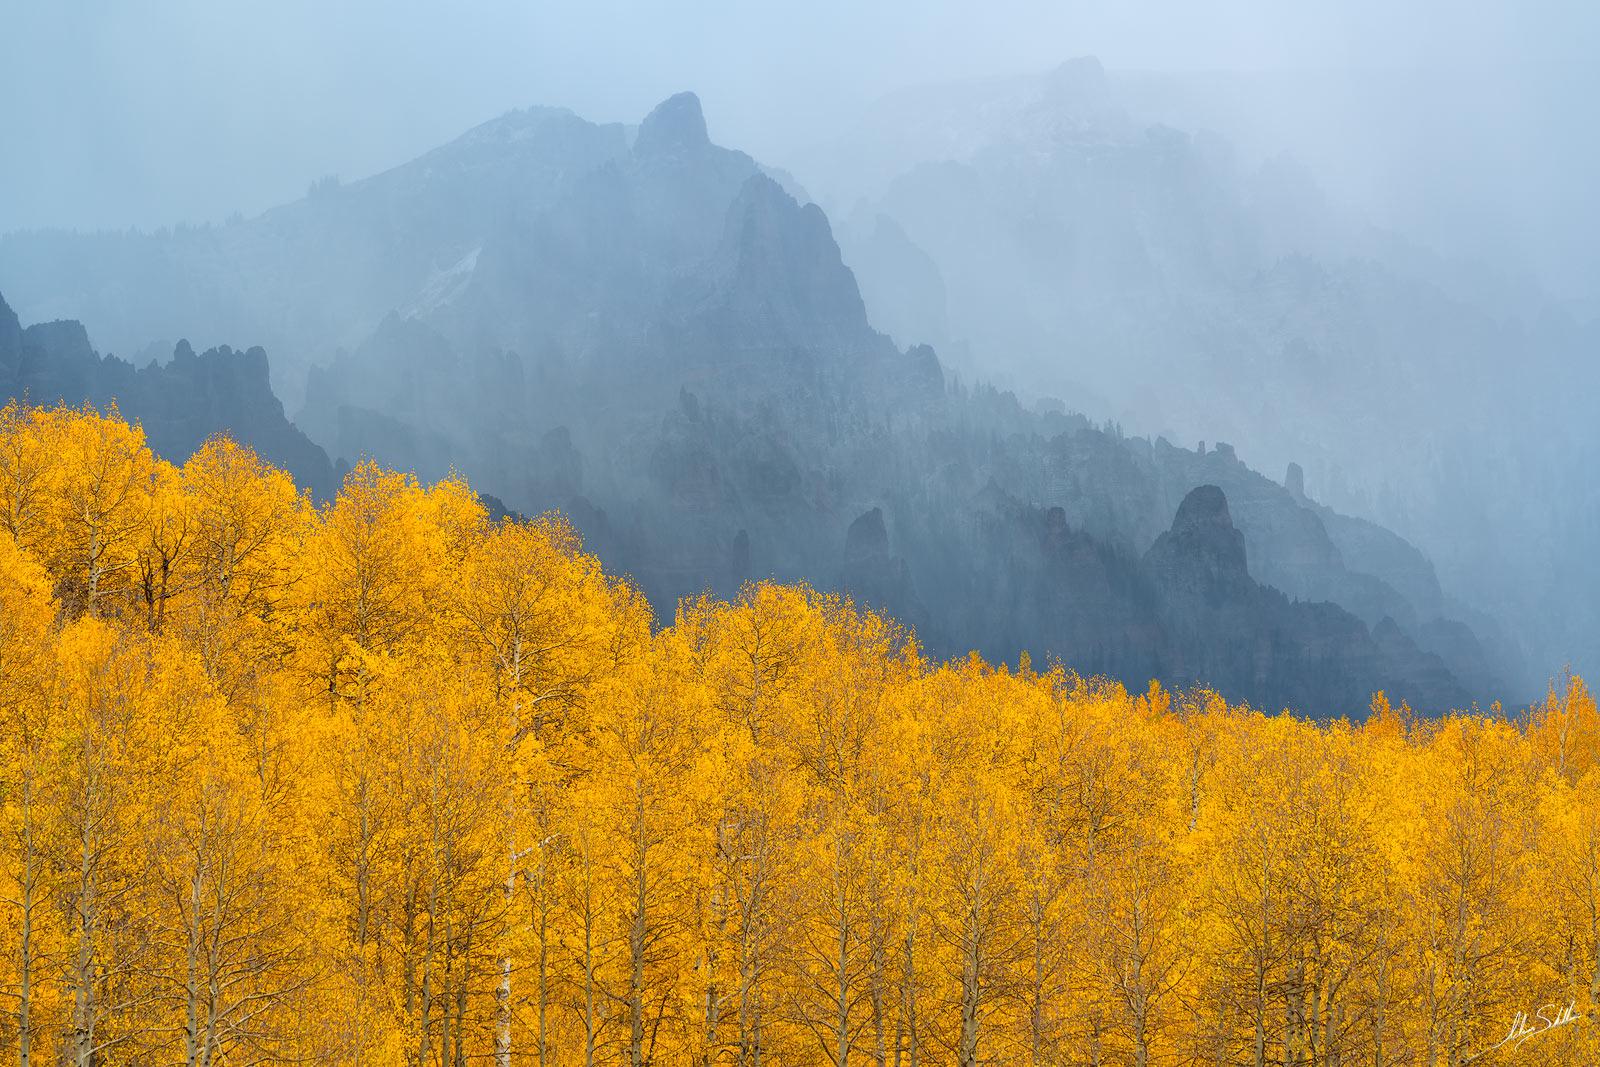 Aspen Trees, Aspens, Autumn, CO, Colorado, Colorado Fall Color, Fall, Fall Color, Fall color in Colorado, Foreboding, Populus tremuloides, Rocky Mountains, San Juan Mountains, Sheep Mountain, Storm, photo